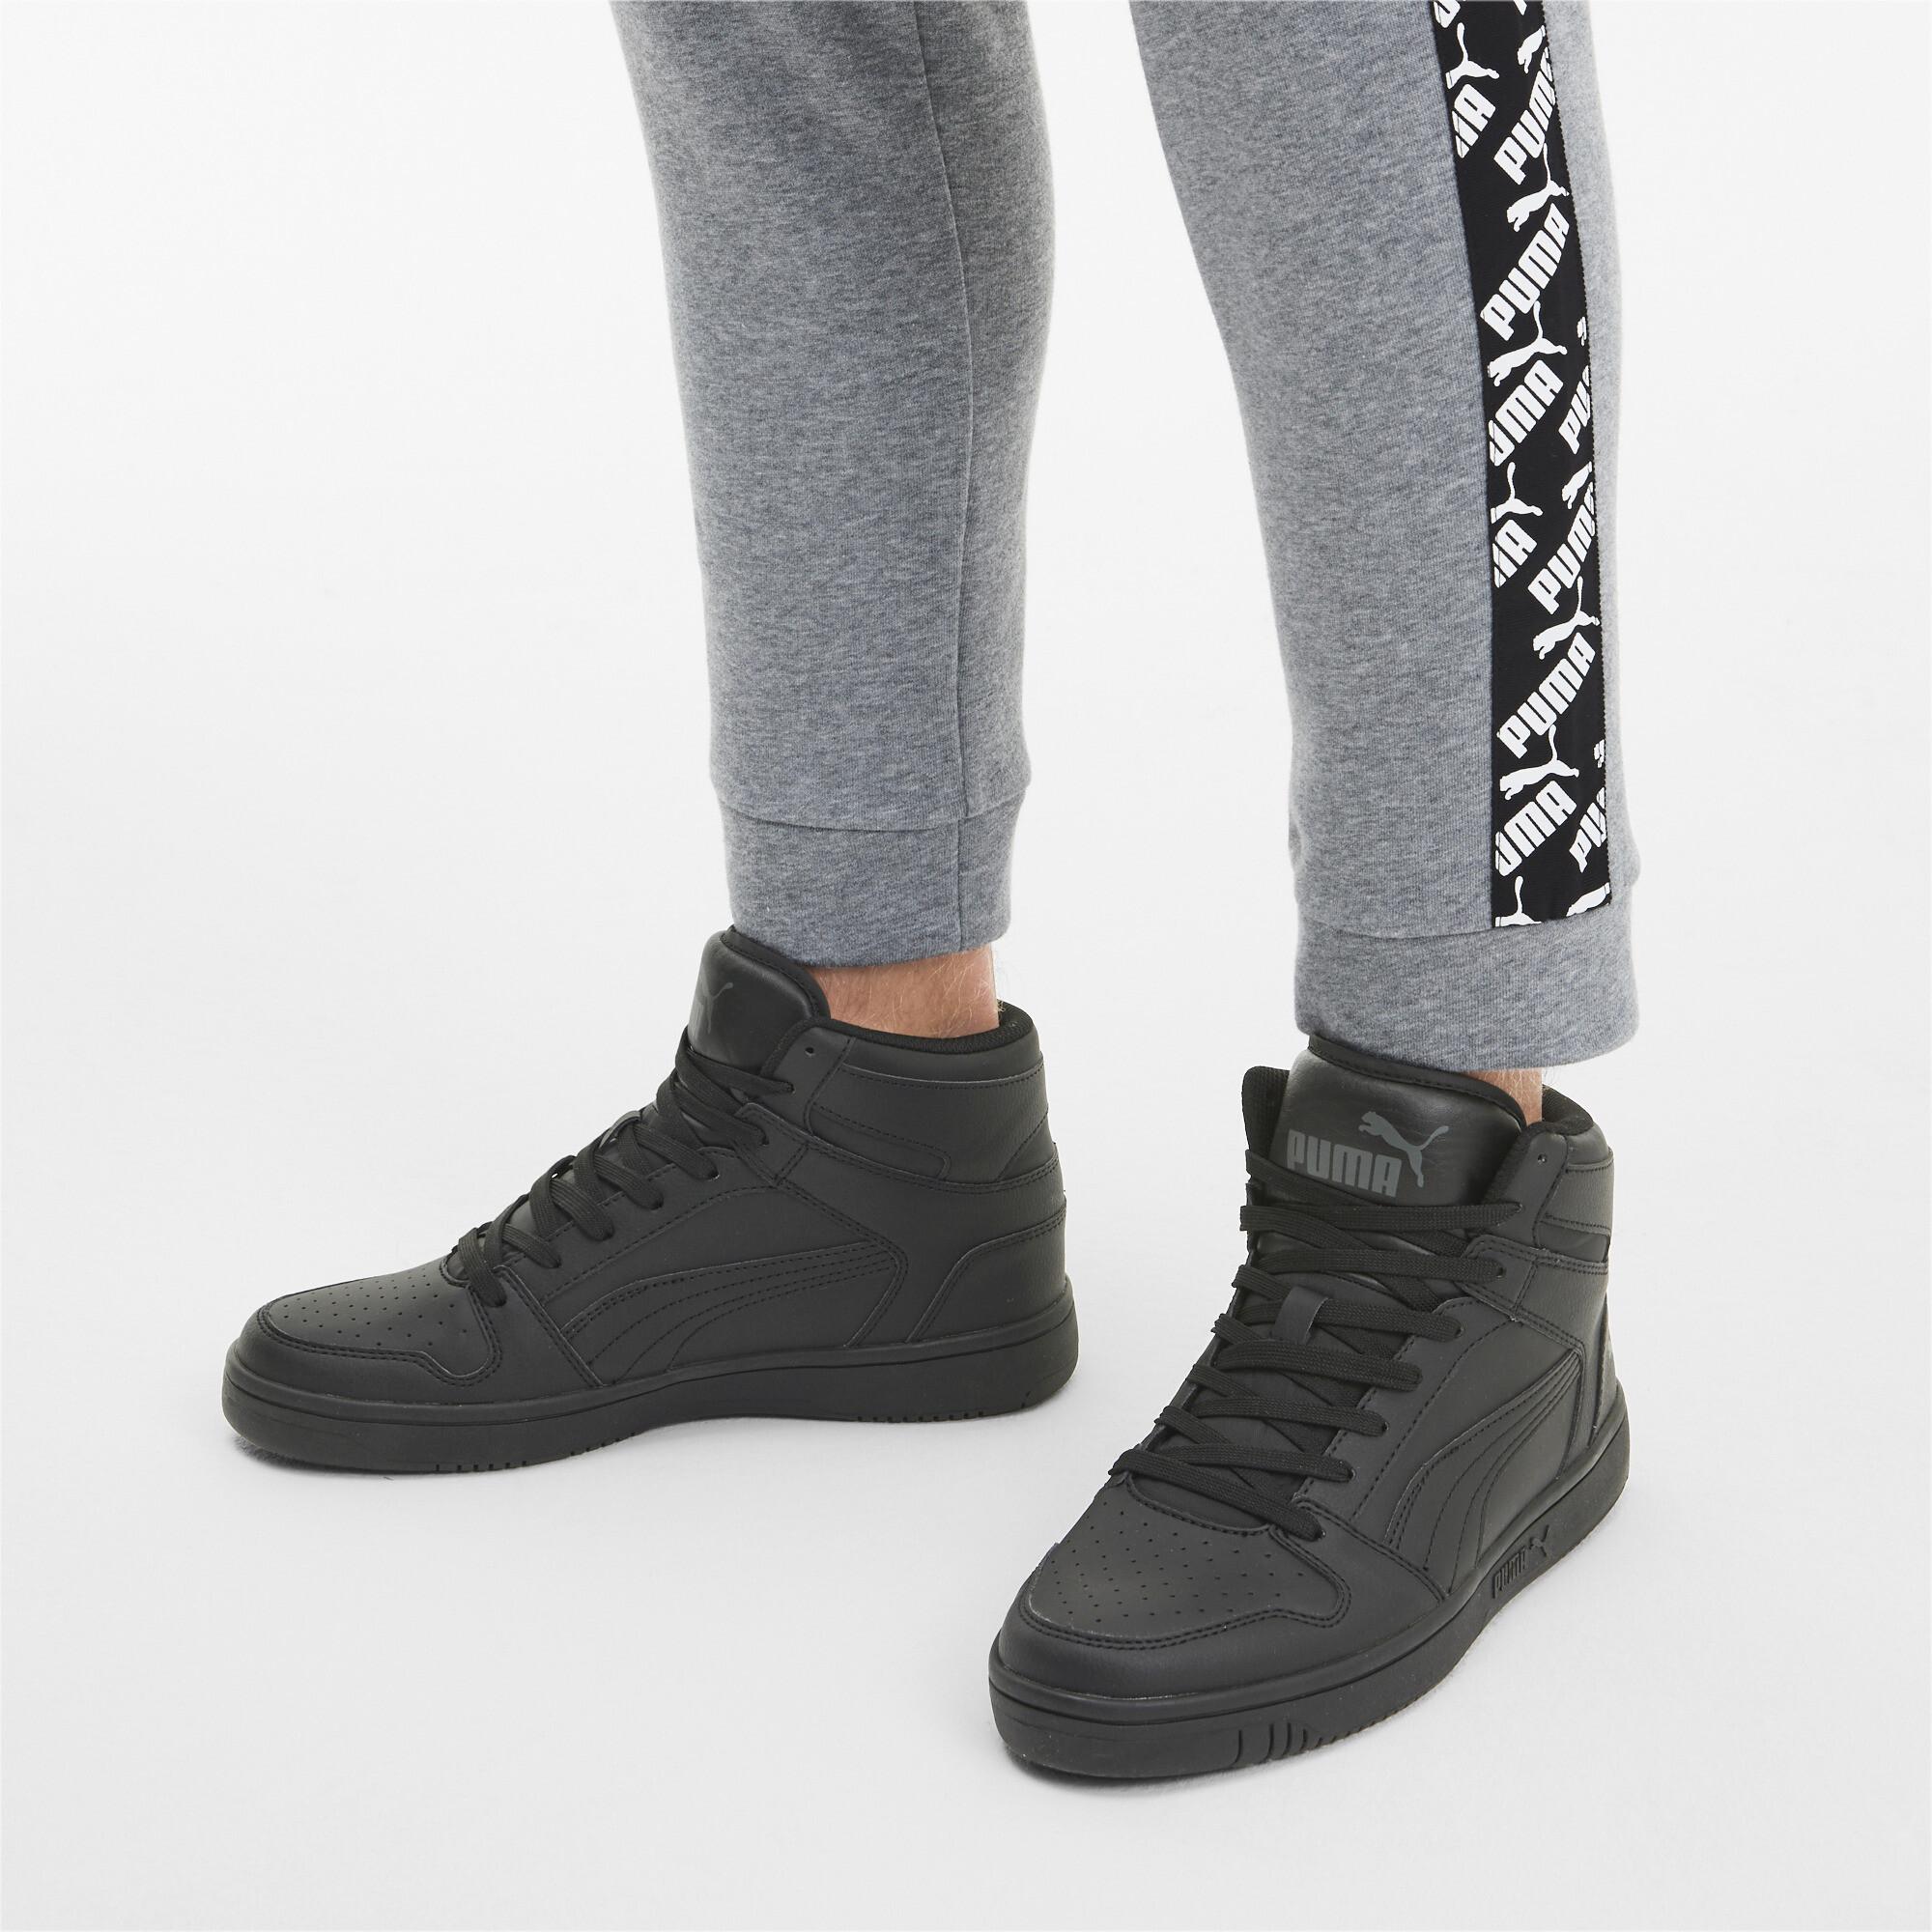 PUMA-PUMA-Rebound-LayUp-Men-039-s-Sneakers-Men-Mid-Boot-Basics thumbnail 28